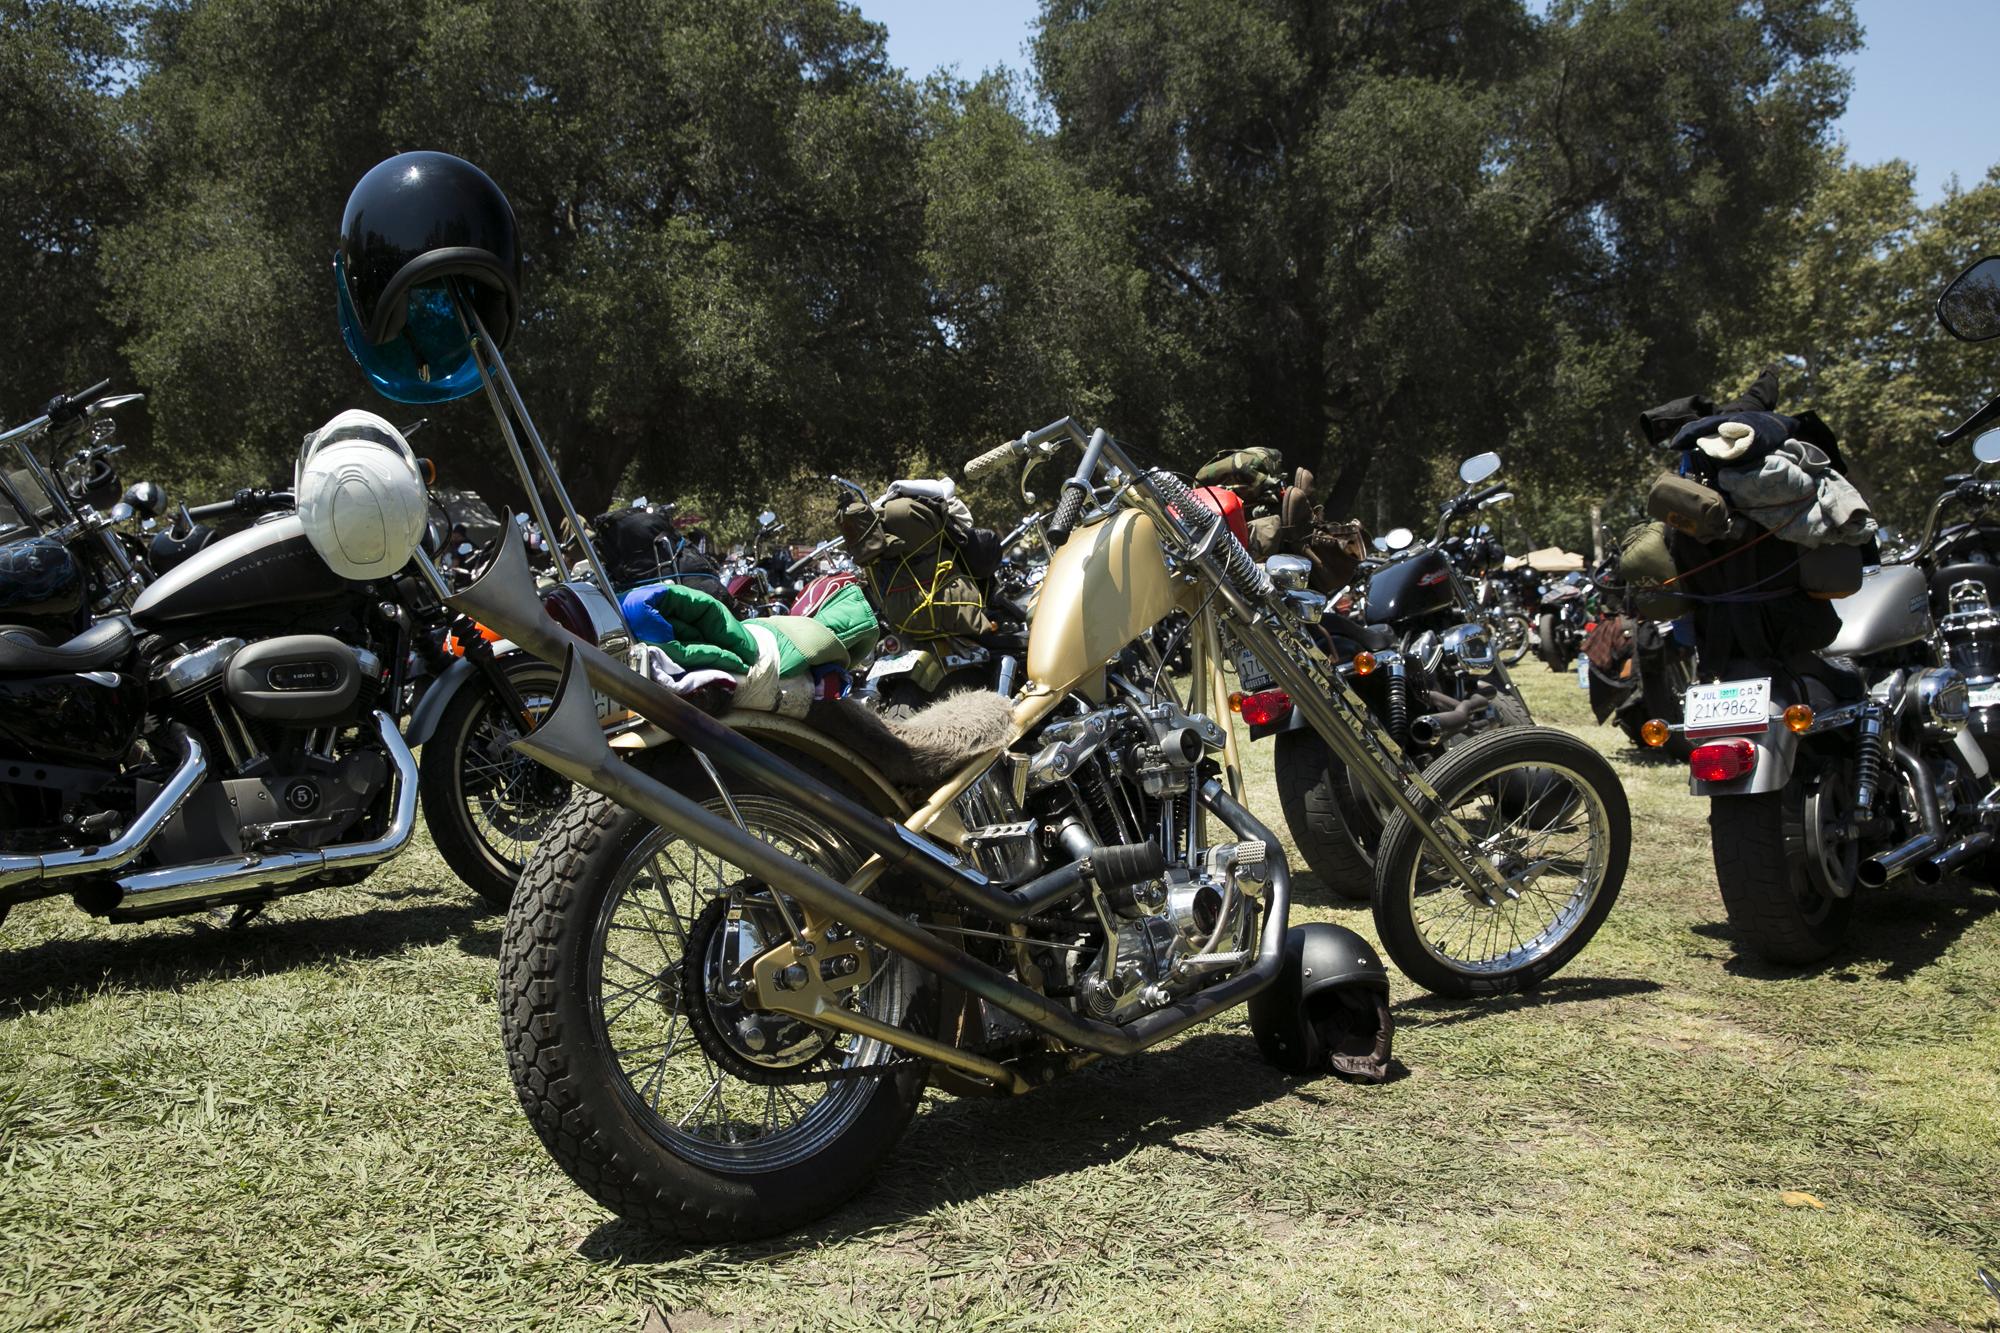 Born Free 8 Motorcycle Show-116.jpg